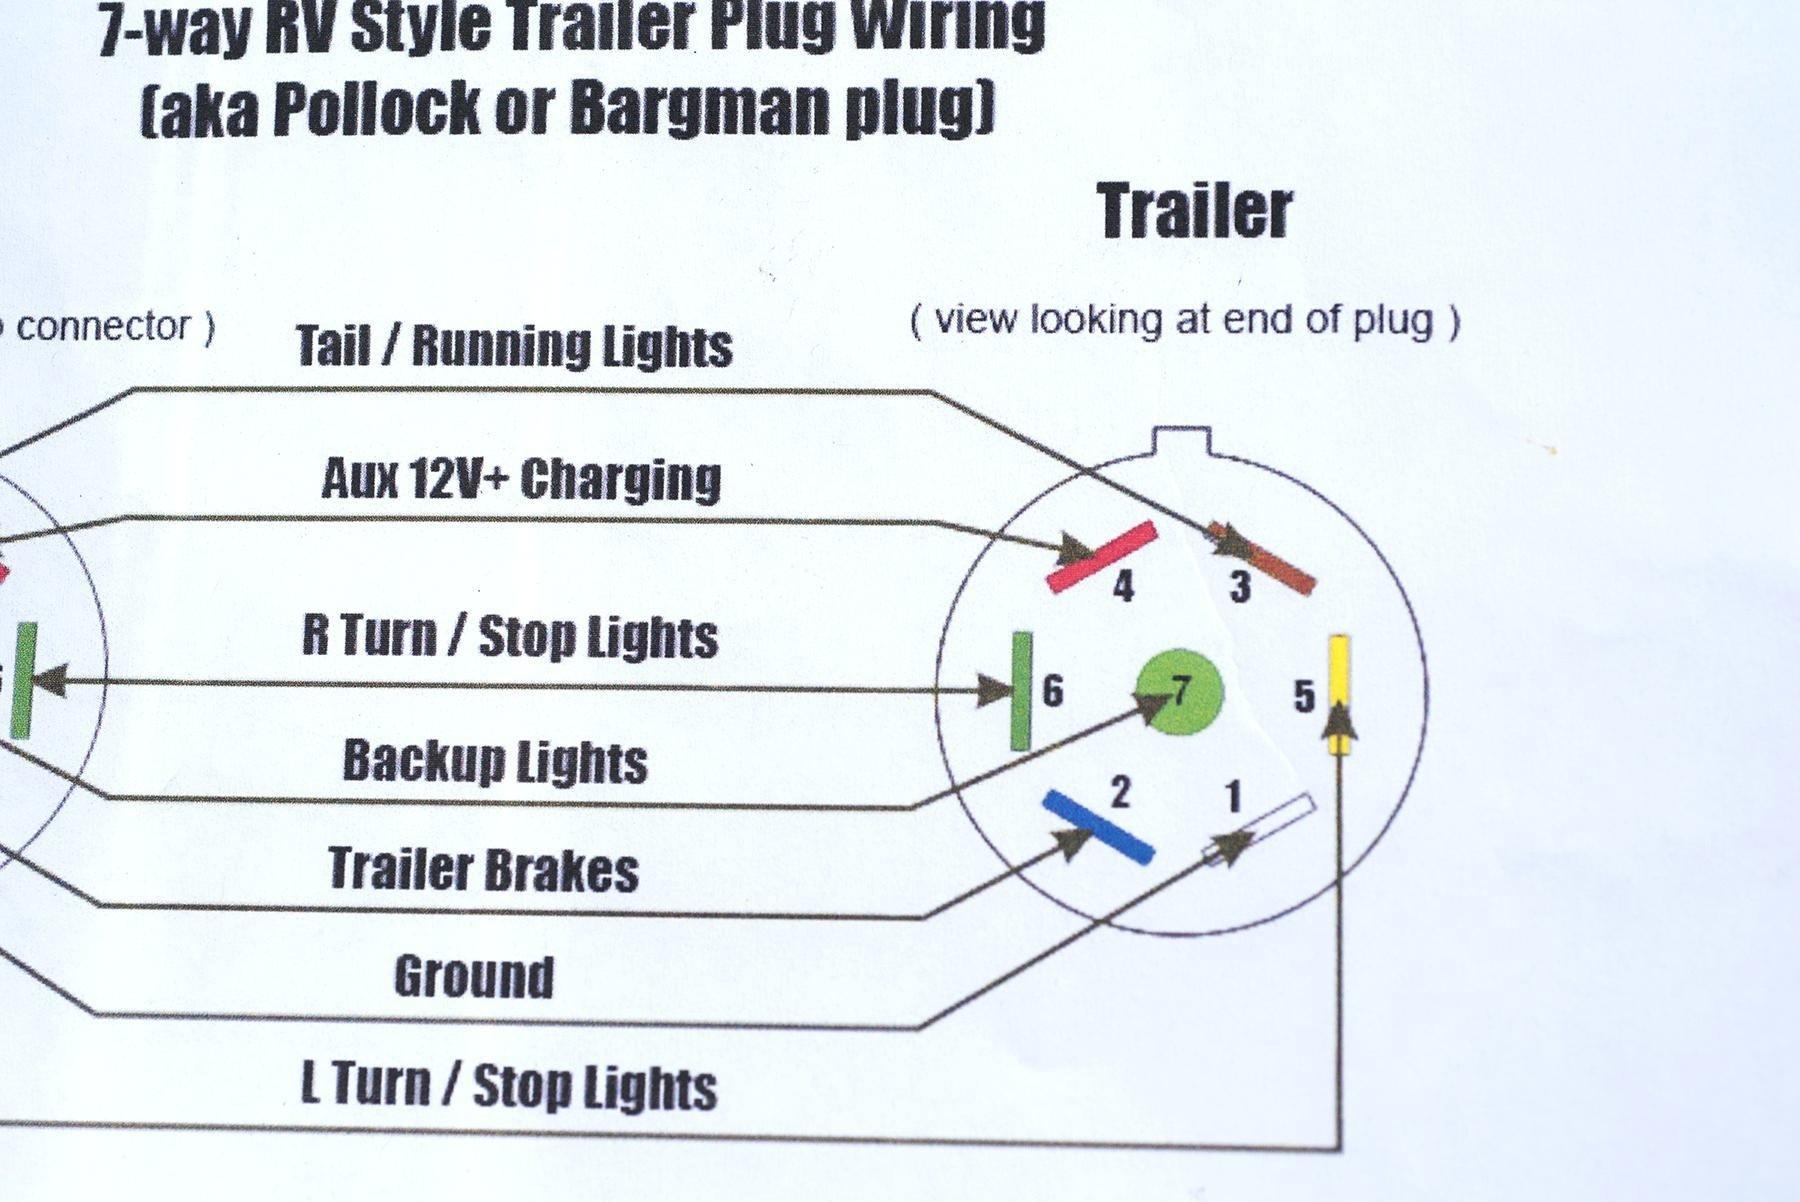 Wiring Diagram Trailer Plug 7 Save 7 Prong Trailer Wiring Diagram originalstylophone